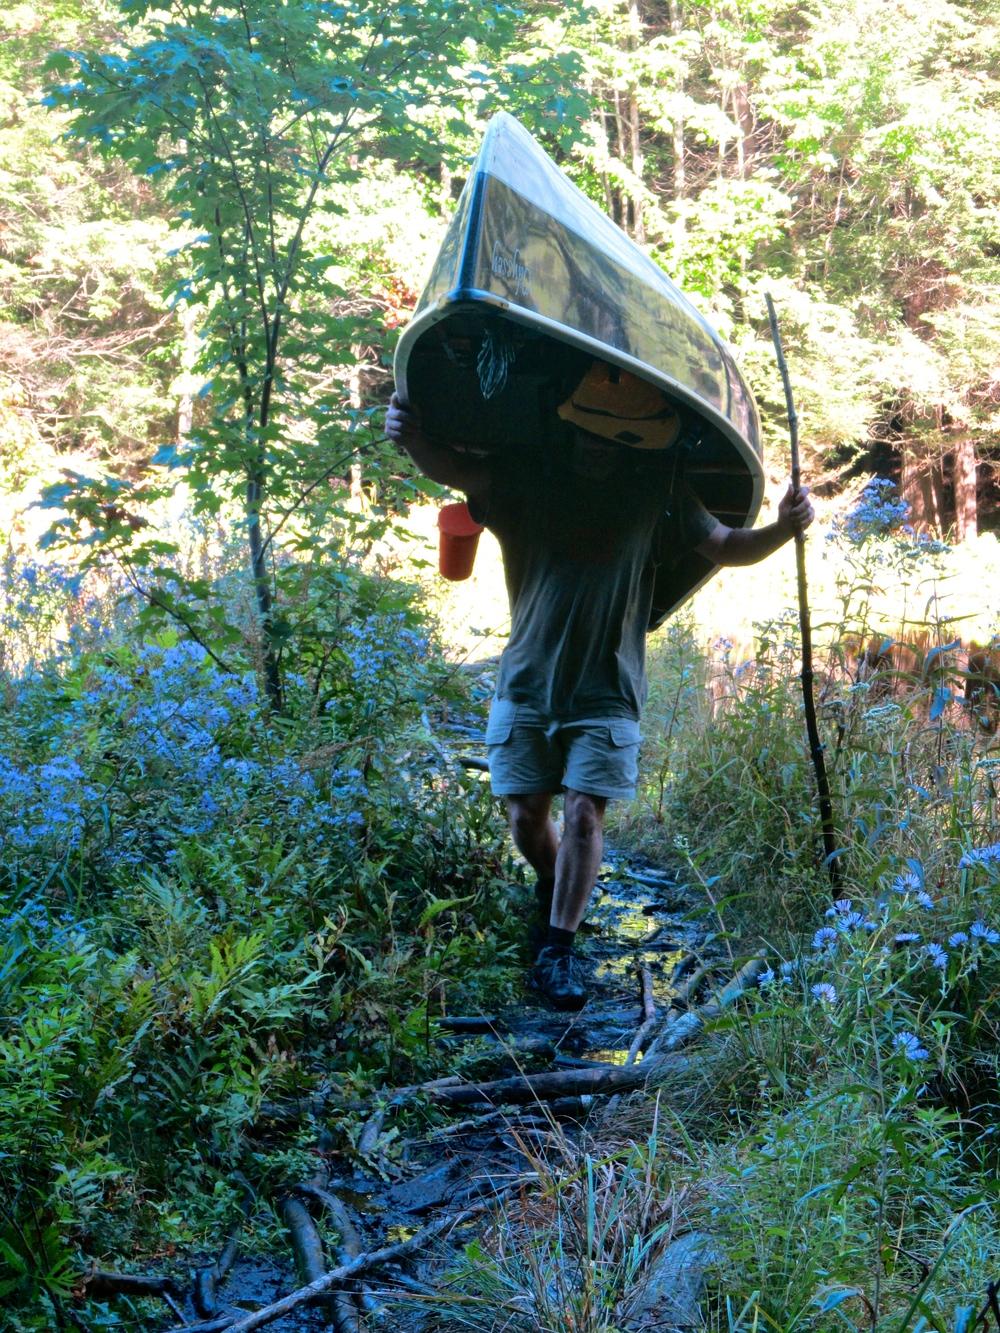 Portaging the canoe over muddy lowlands: Chris Scerri